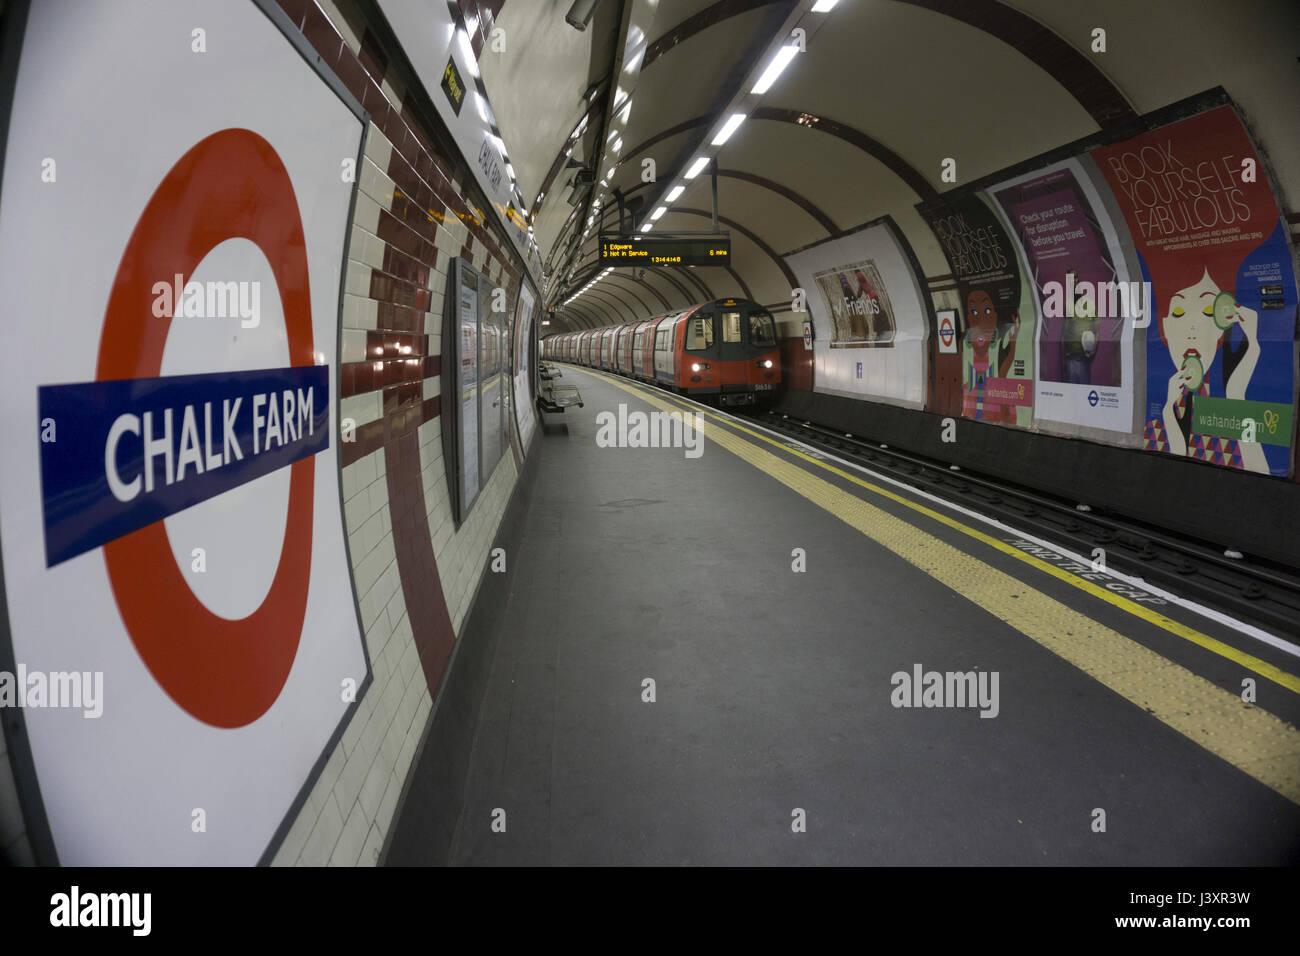 Chalk Farm underground station on London's Northern Line, the nearest stop to Camden market - Stock Image